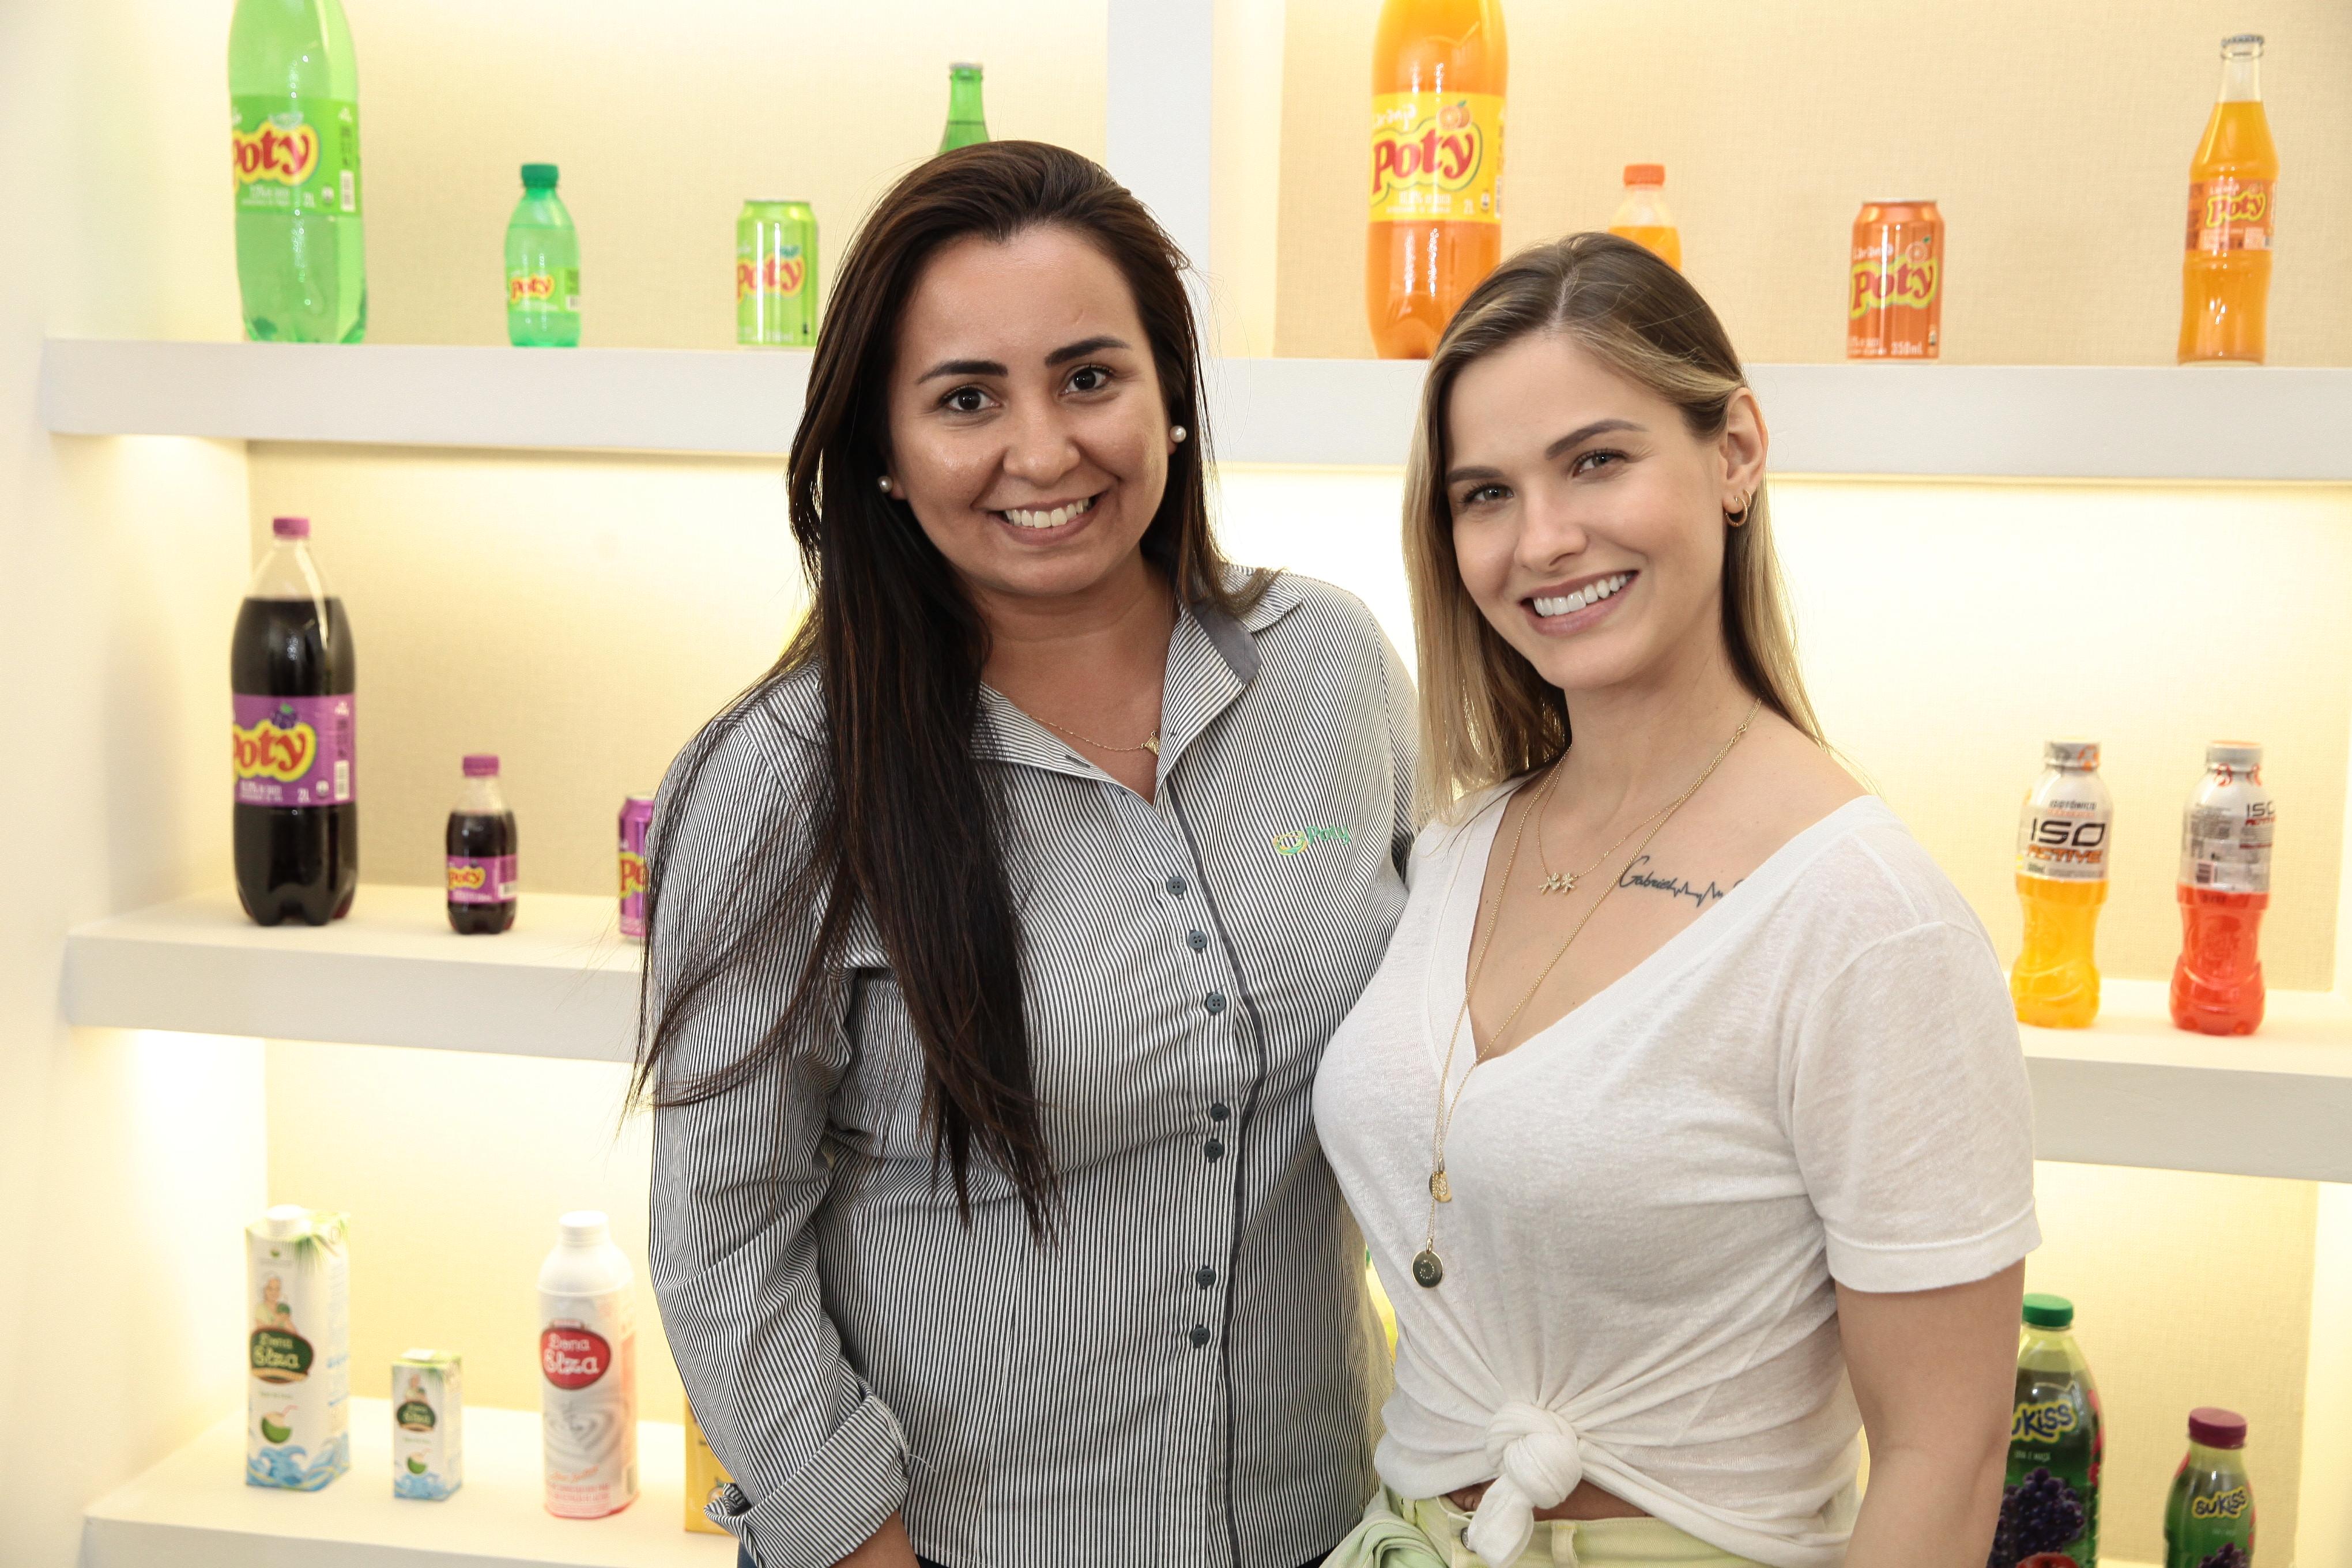 Ana Luiza Siqueira Bueno, gerente de marketing da Poty e Andressa Suita –   Foto Arnaldo Mussi bb7f3478aa